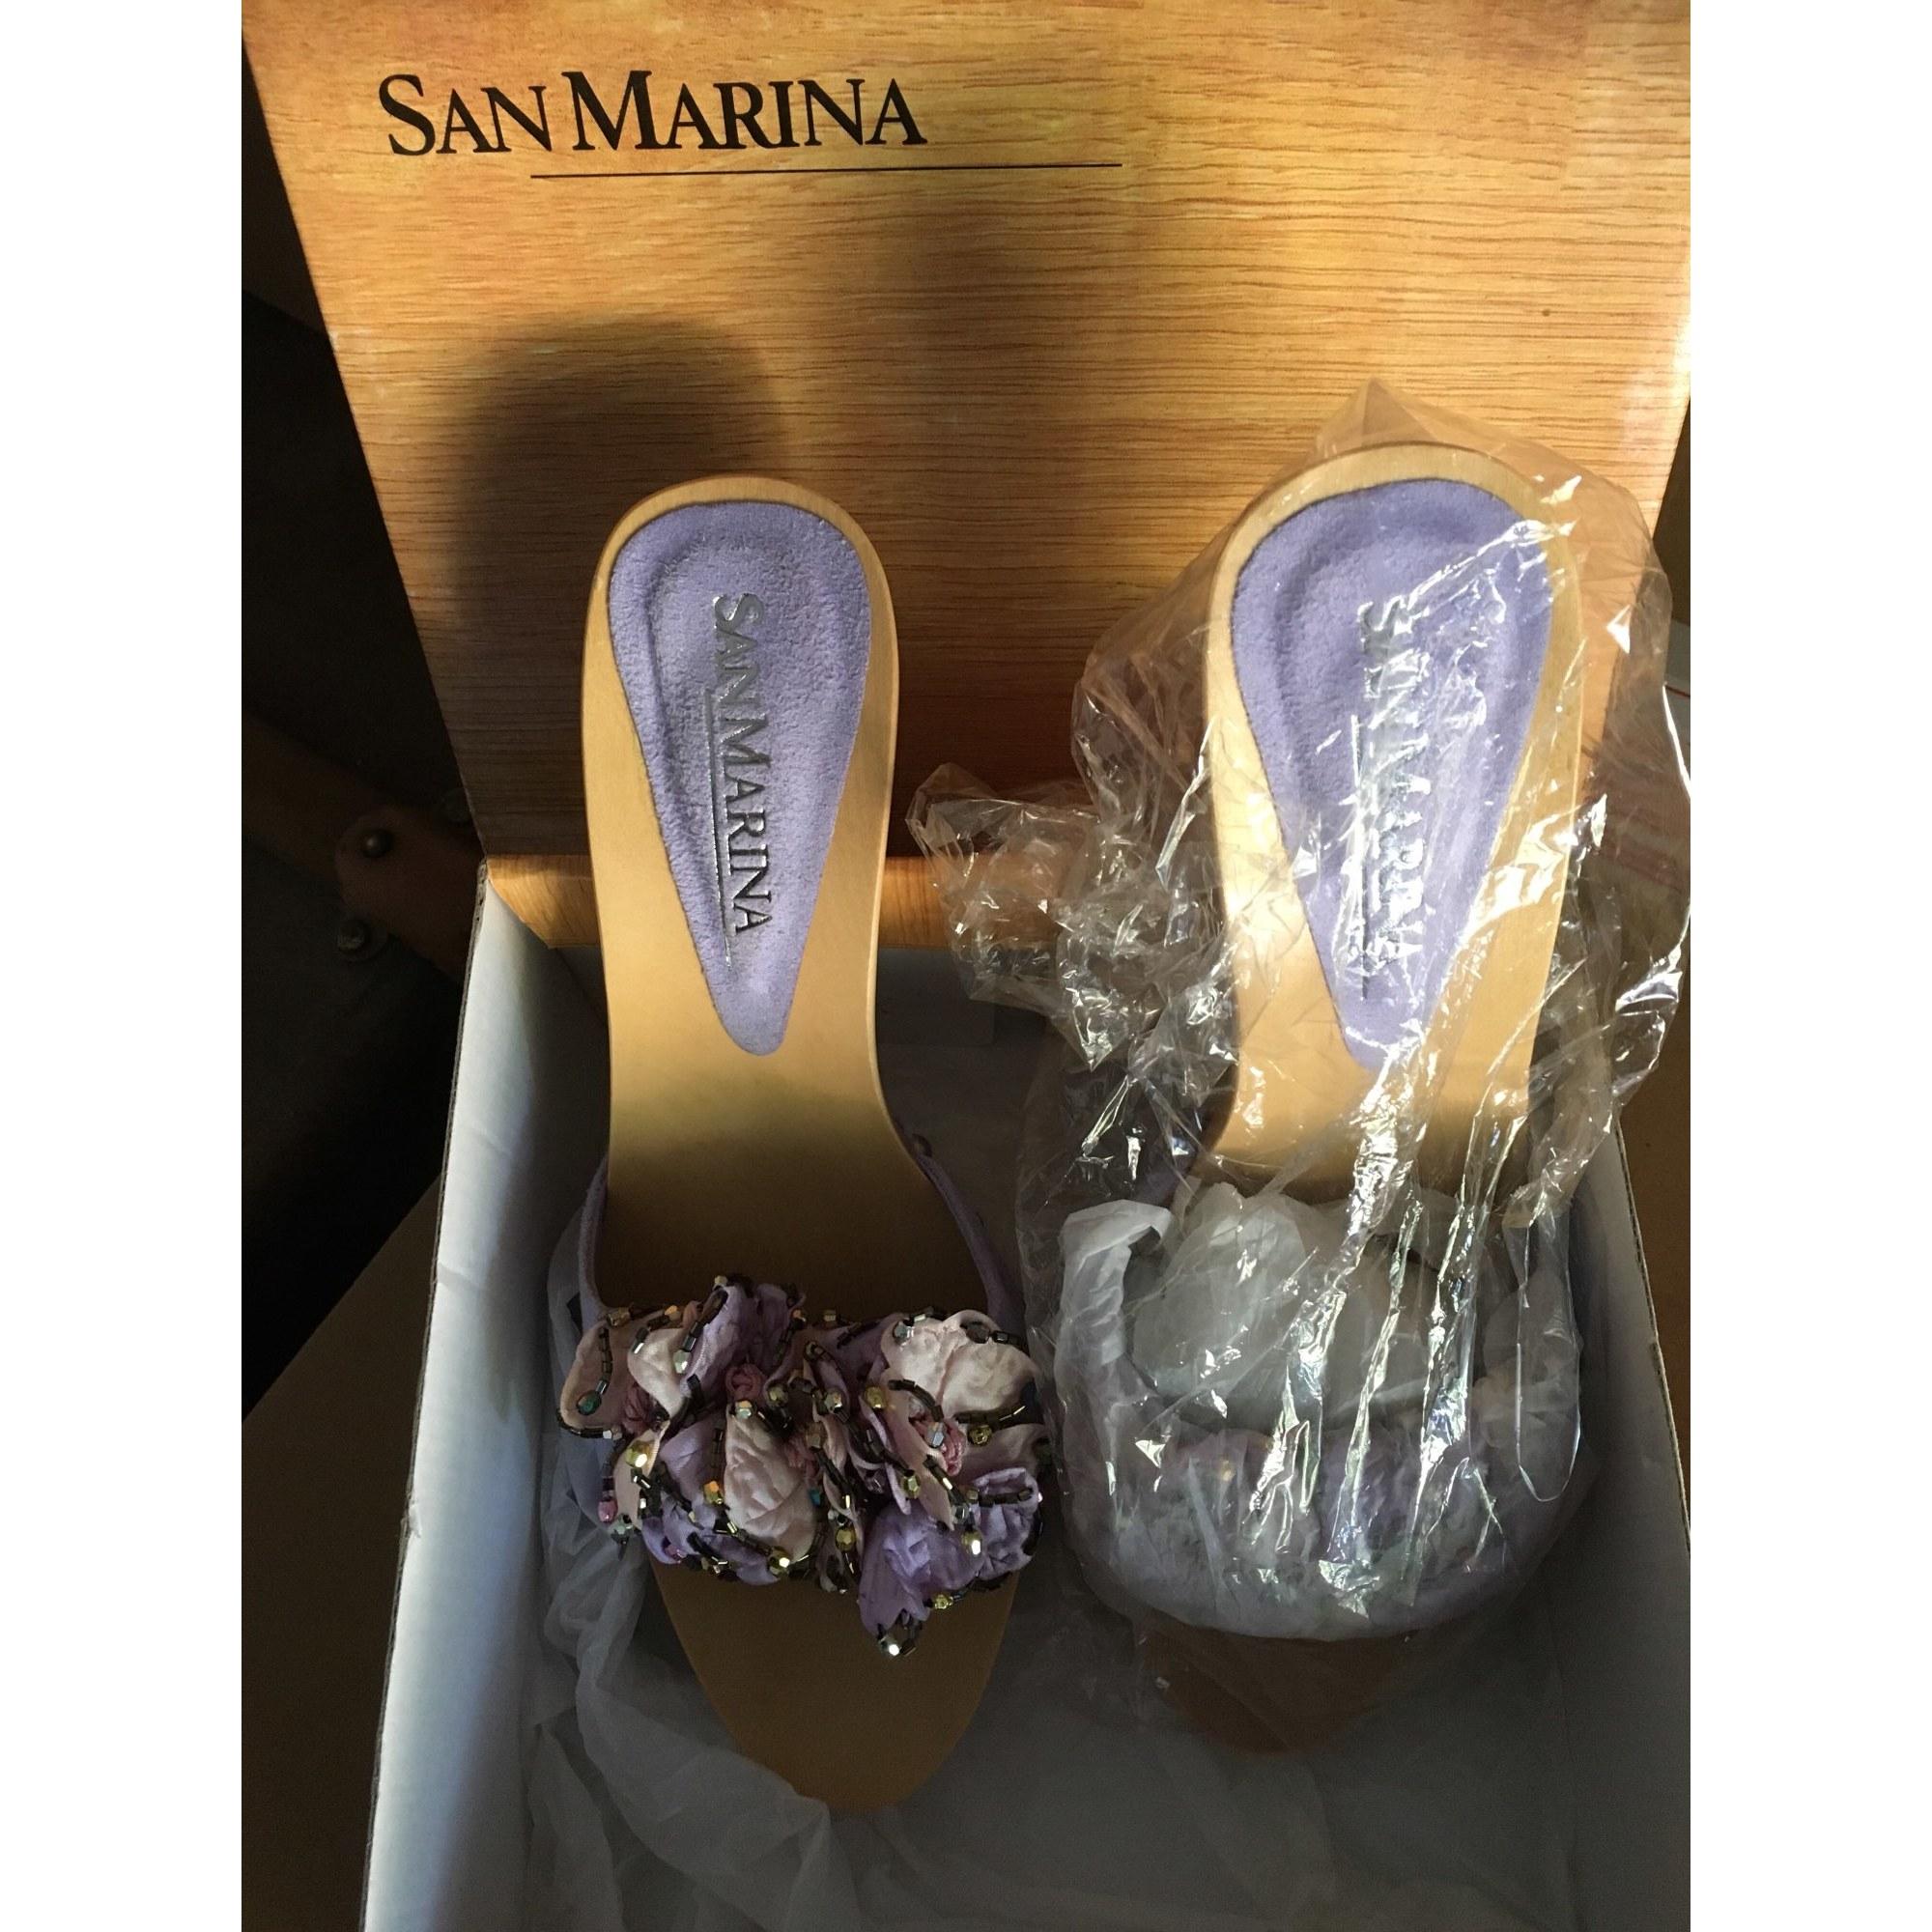 Sabots SAN MARINA Violet, mauve, lavande